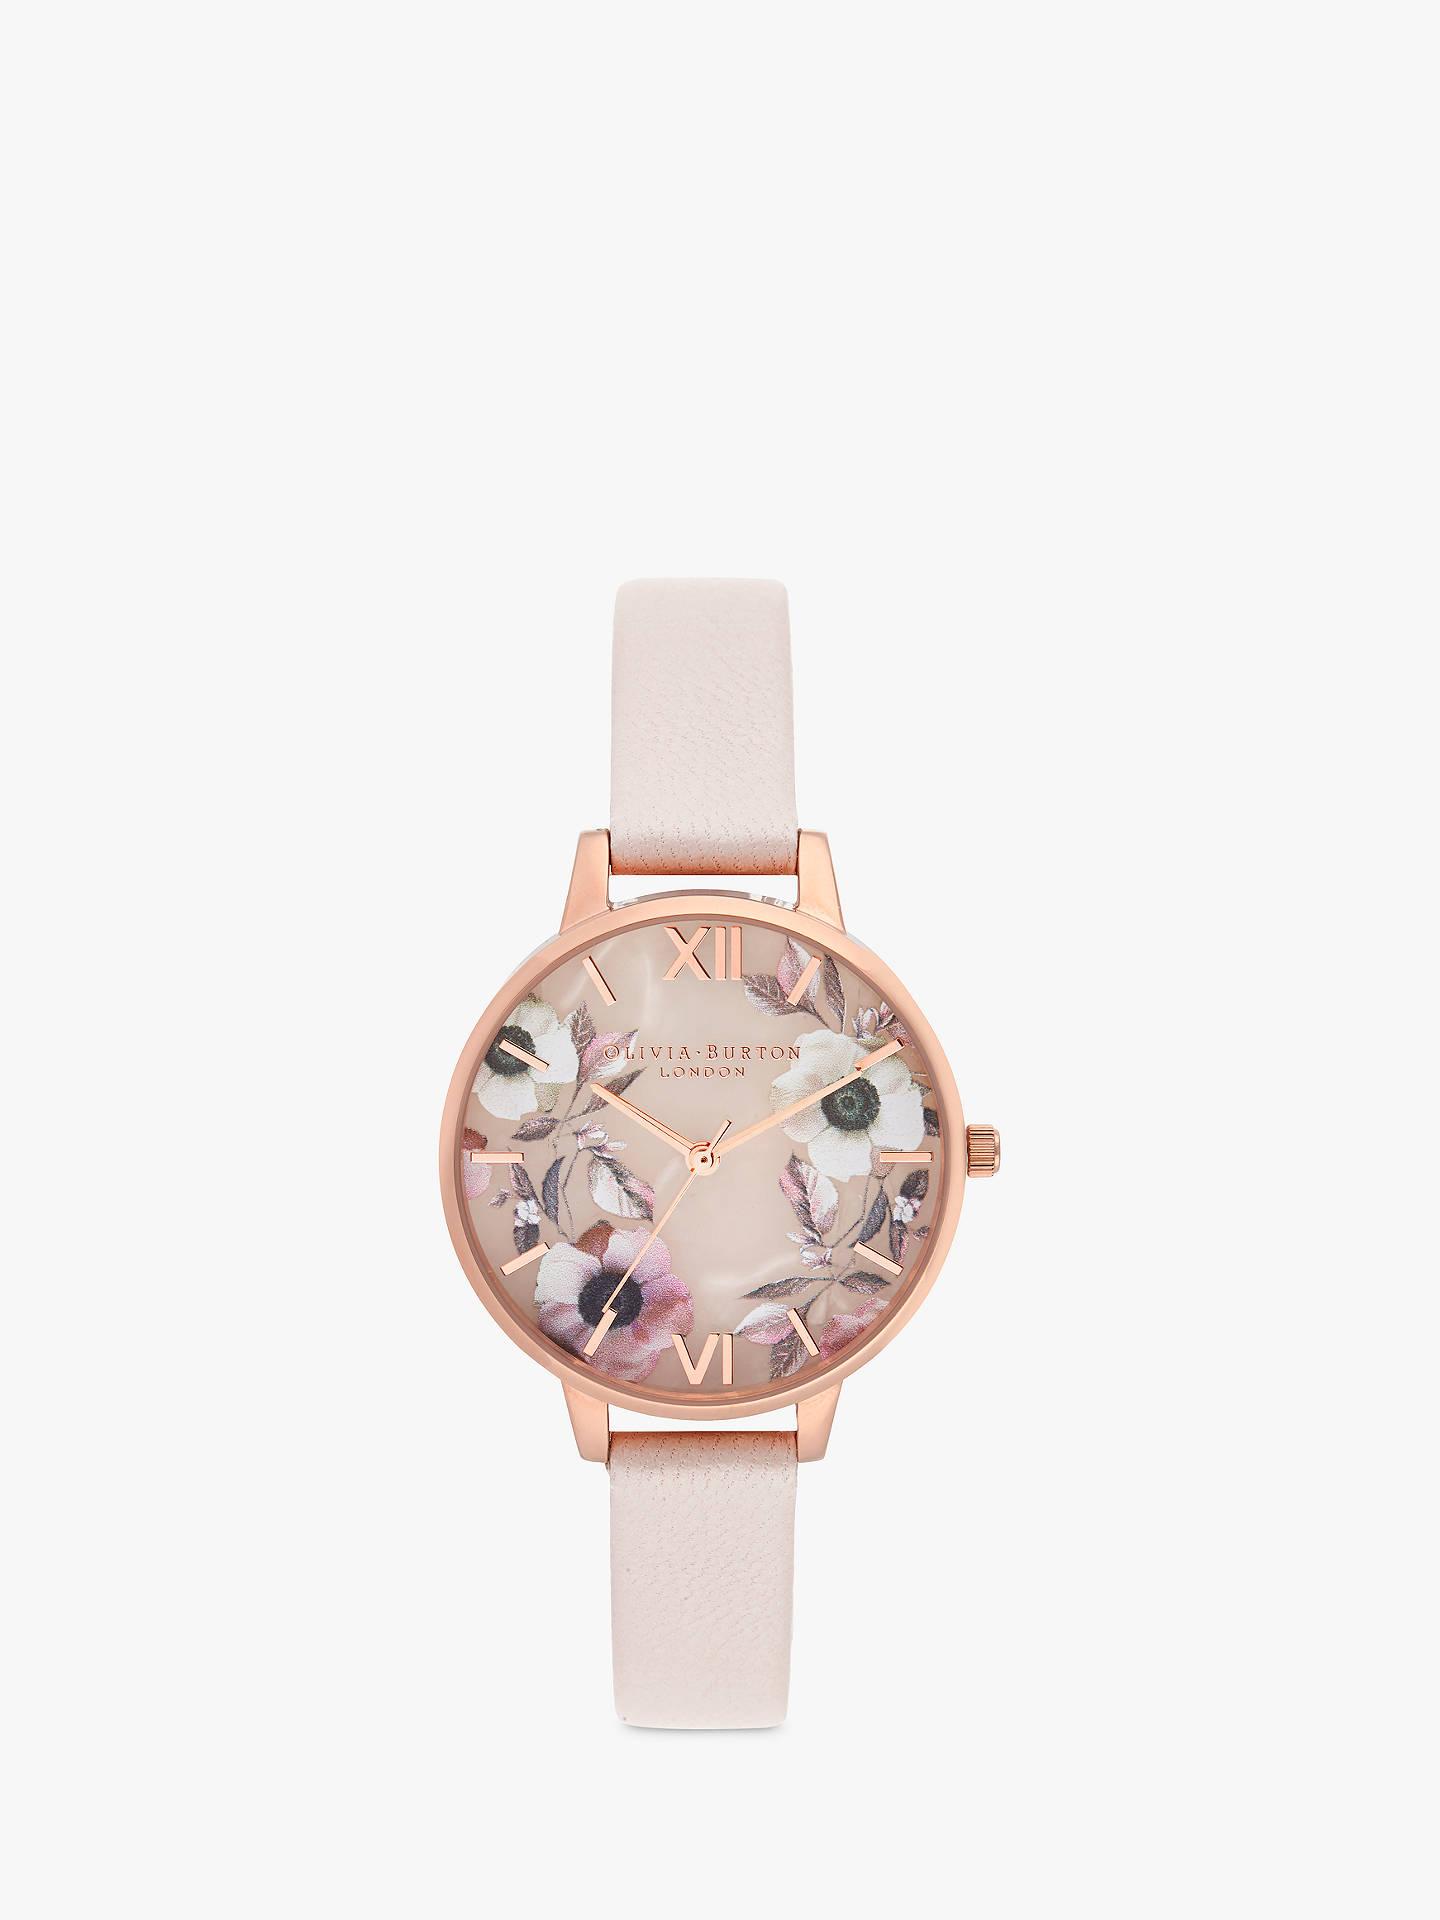 b5f02cfc6bf59 Buy Olivia Burton OB16SP14 Women s Semi Precious Leather Strap Round Watch